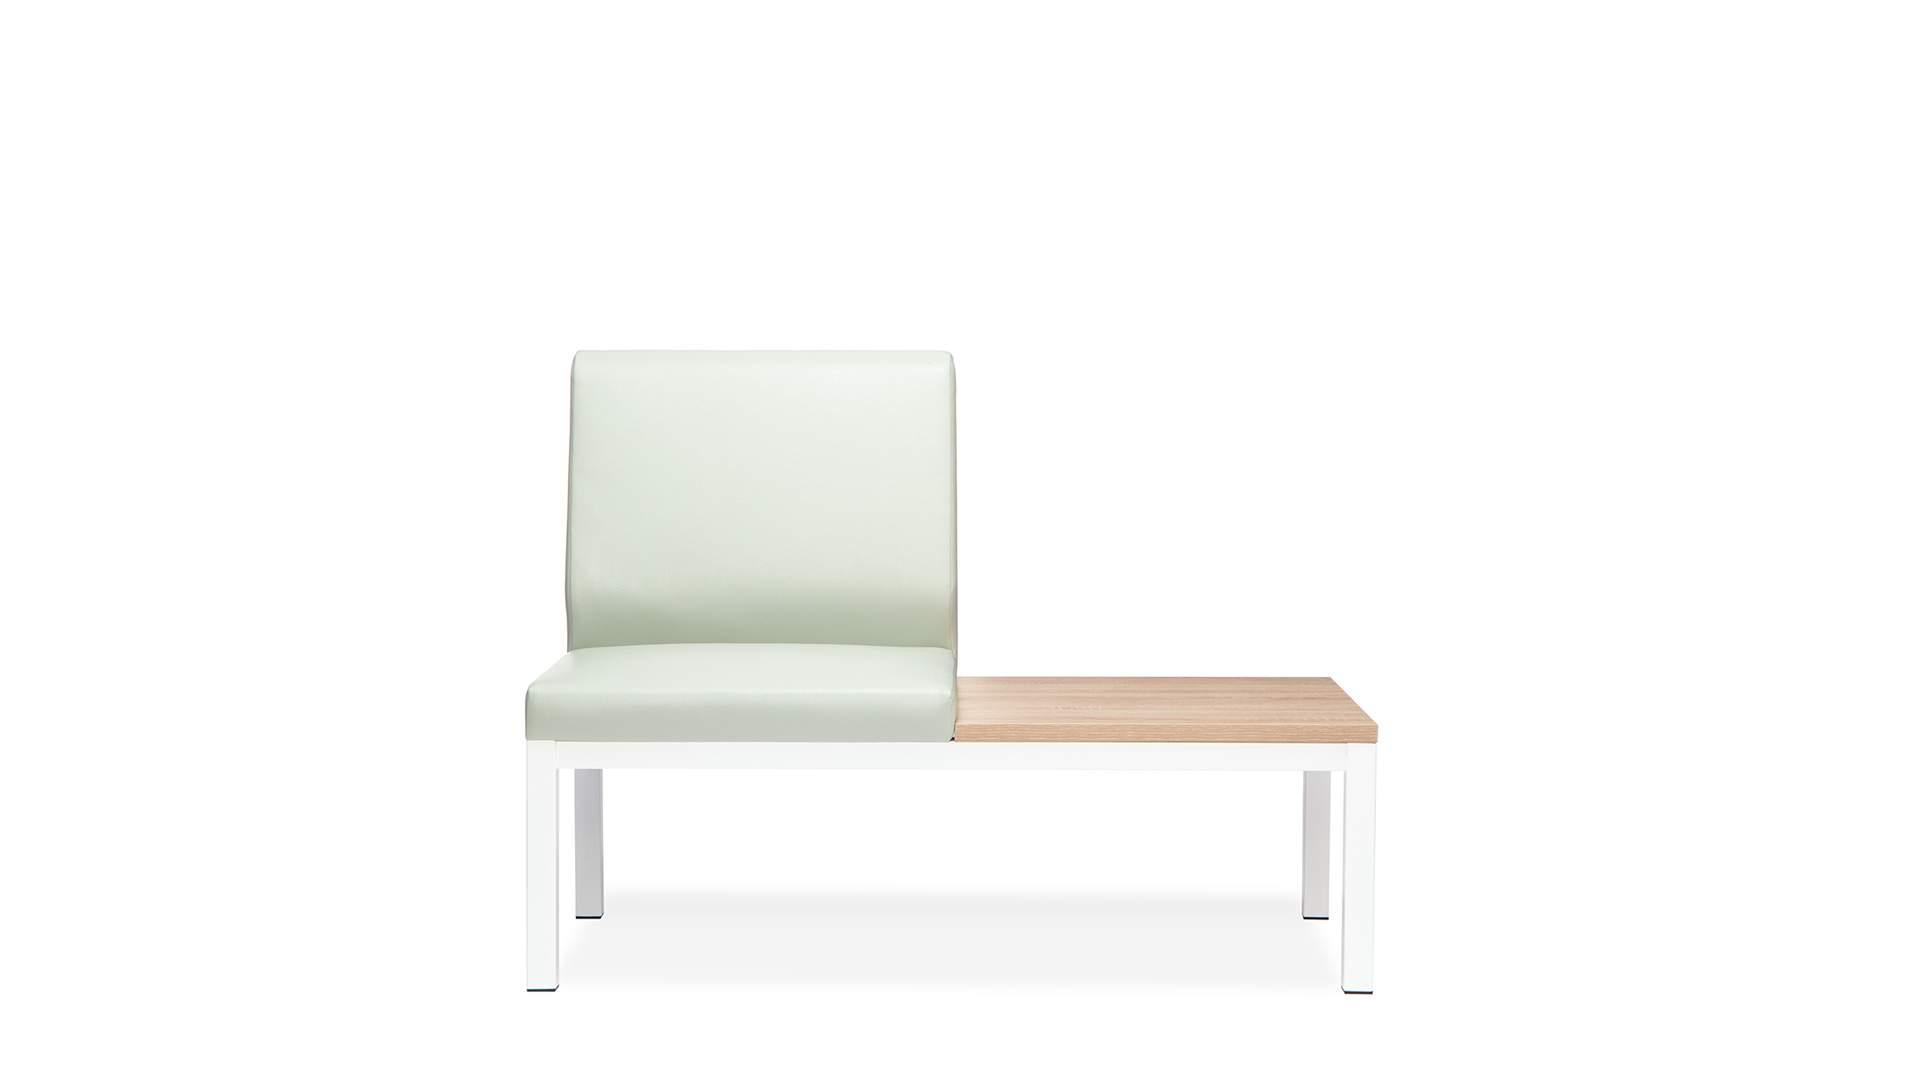 Кресло одноместное без п\л со столиком  Норман 1200x660x890